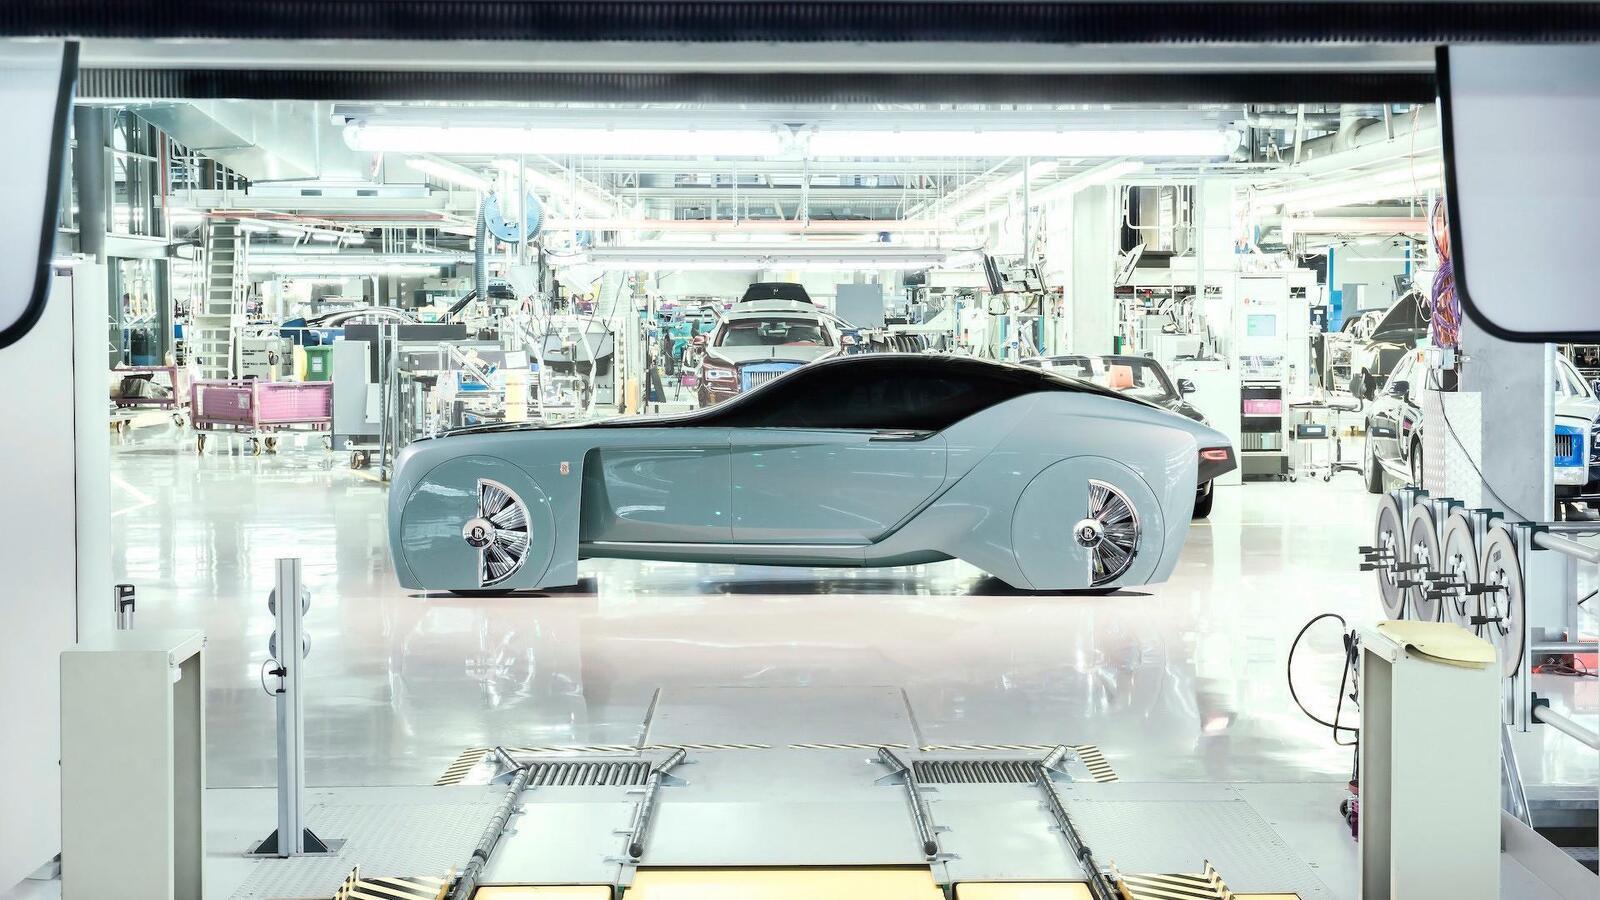 rolls-royce-vision-next-100-concept8.jpg